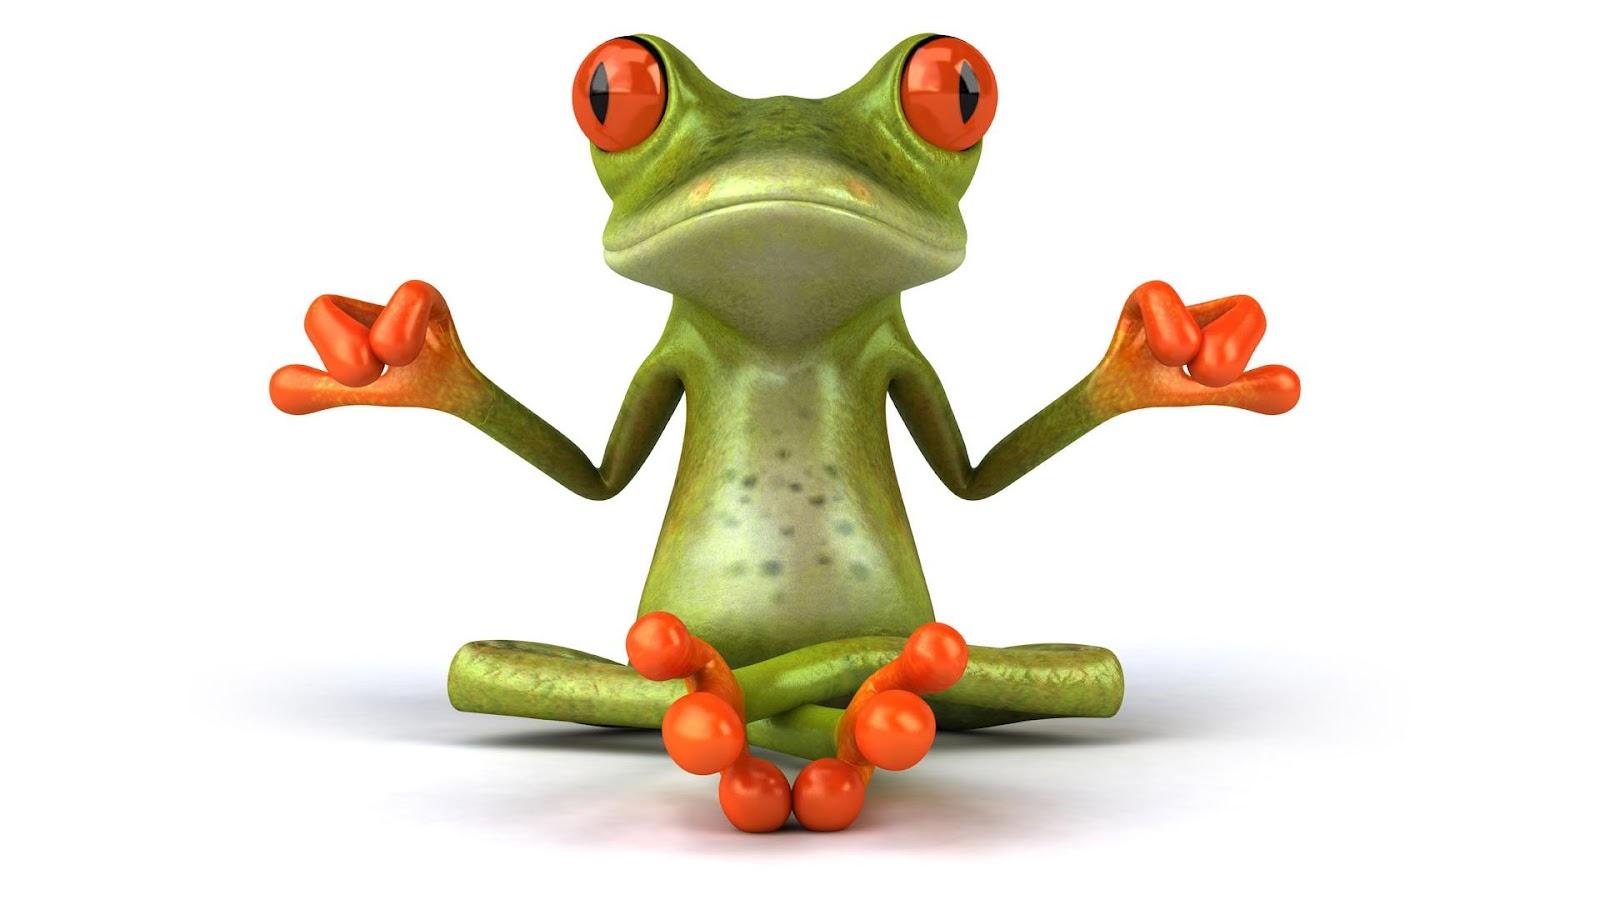 http://3.bp.blogspot.com/--2WINXP2Hi4/UB6BI-DMBeI/AAAAAAAAK5k/UiA5B9k861Y/s1600/animal-frog-3d-funny-1080x1920.jpg